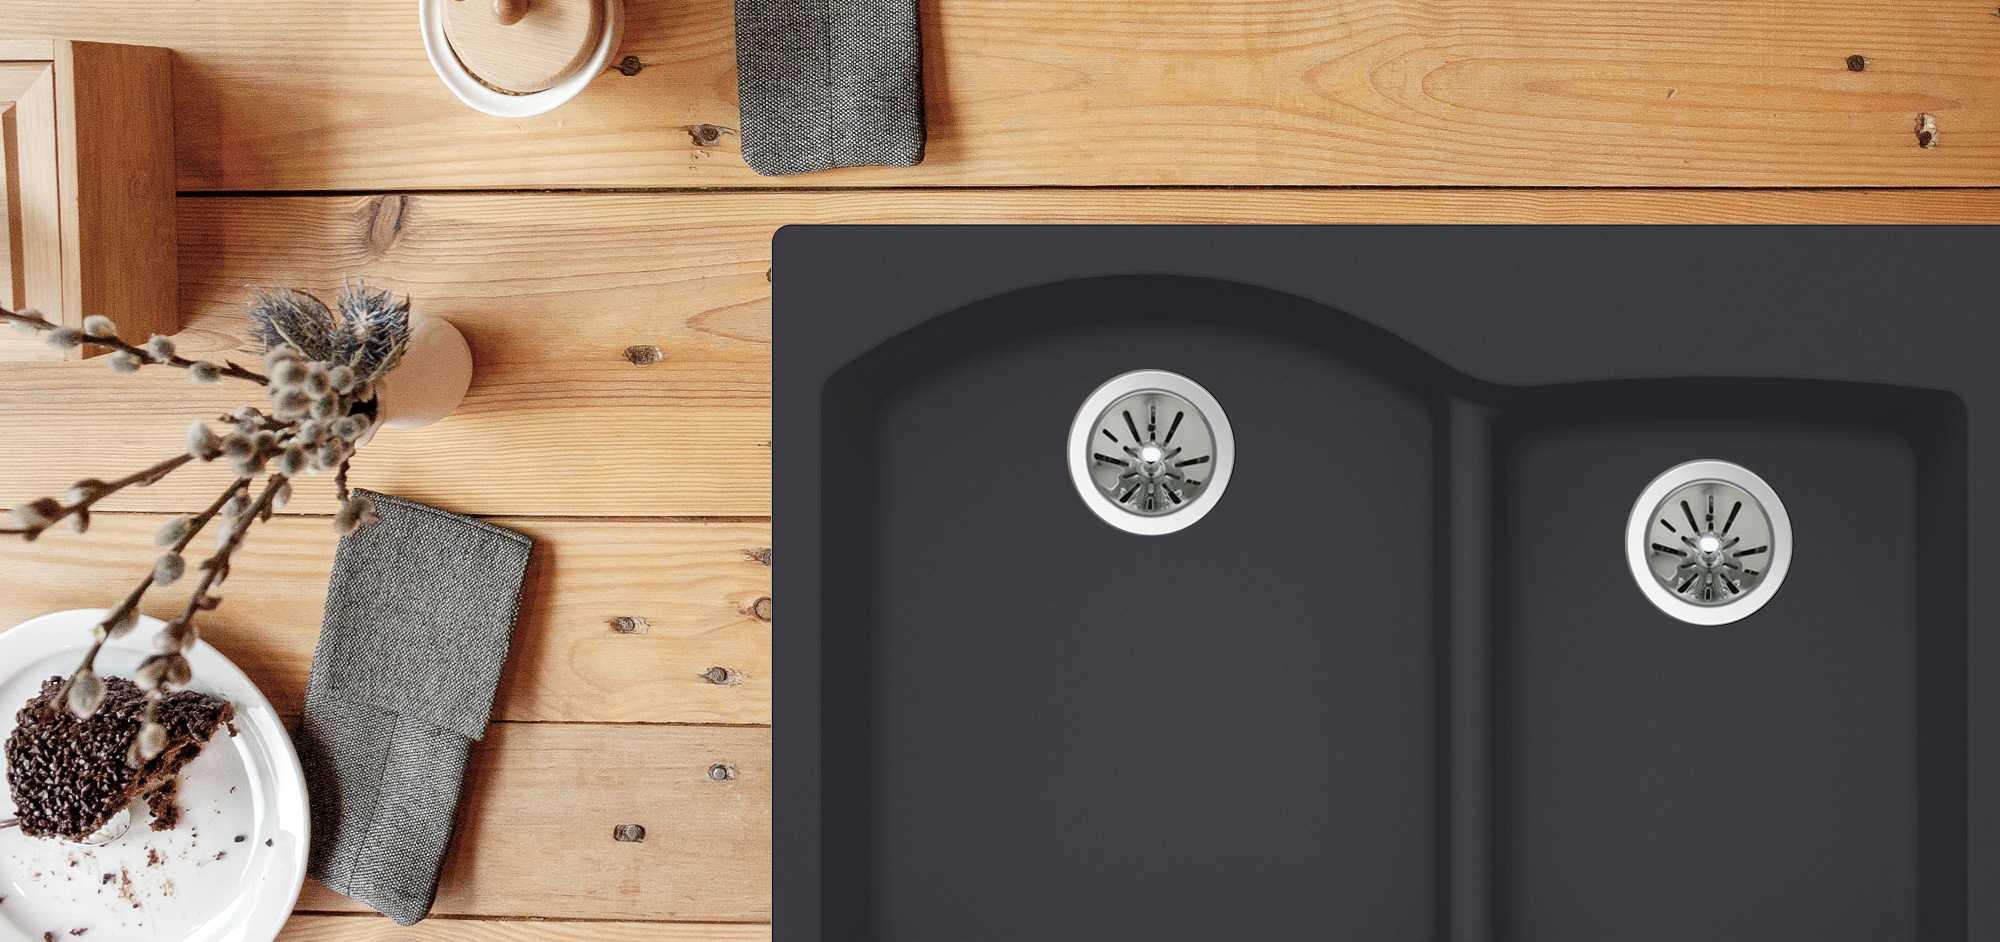 Quartz luxe kitchen sinks elkay workwithnaturefo